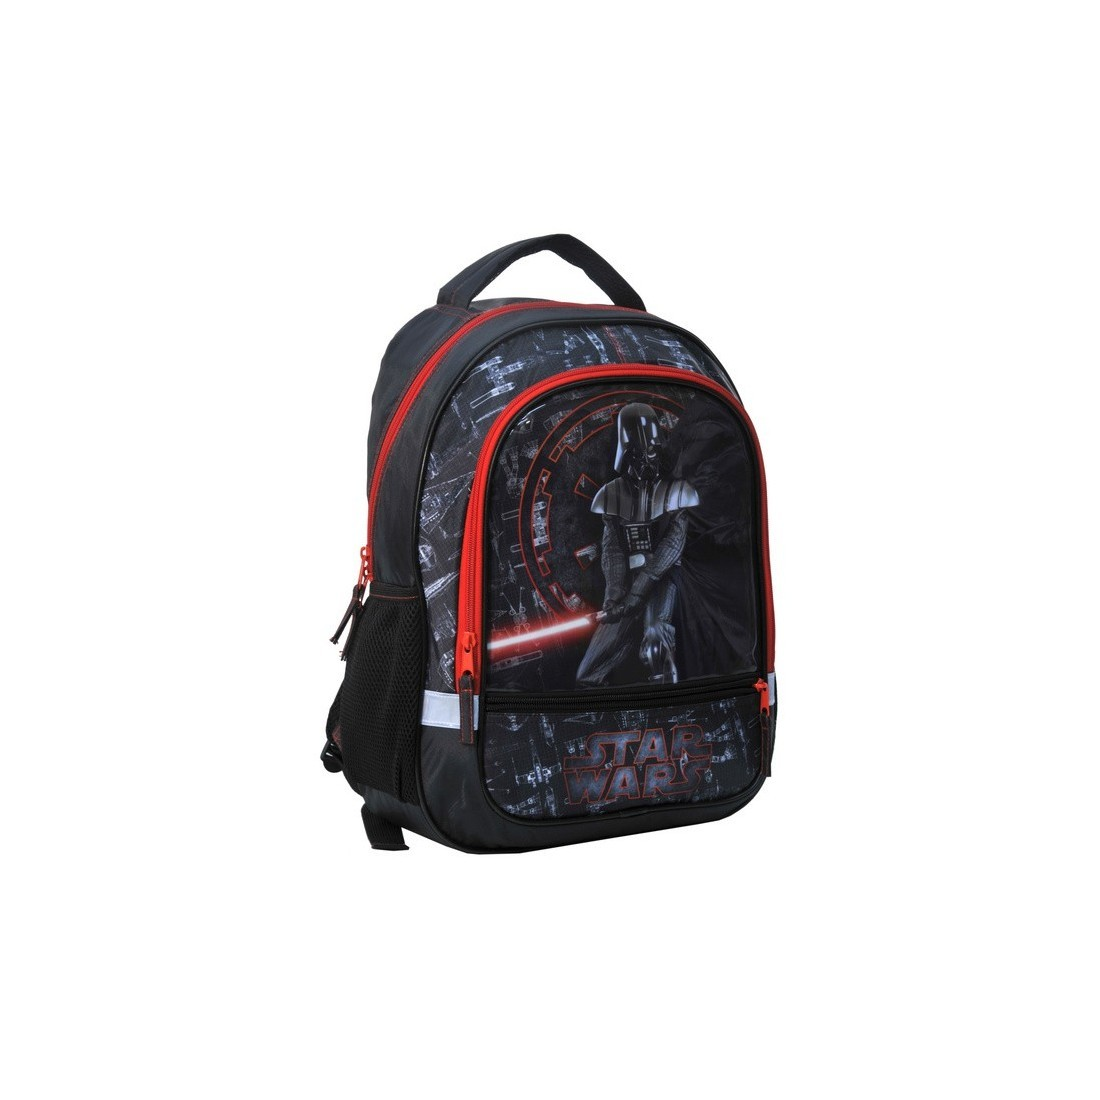 Plecak szkolny Star Wars - plecak-tornister.pl